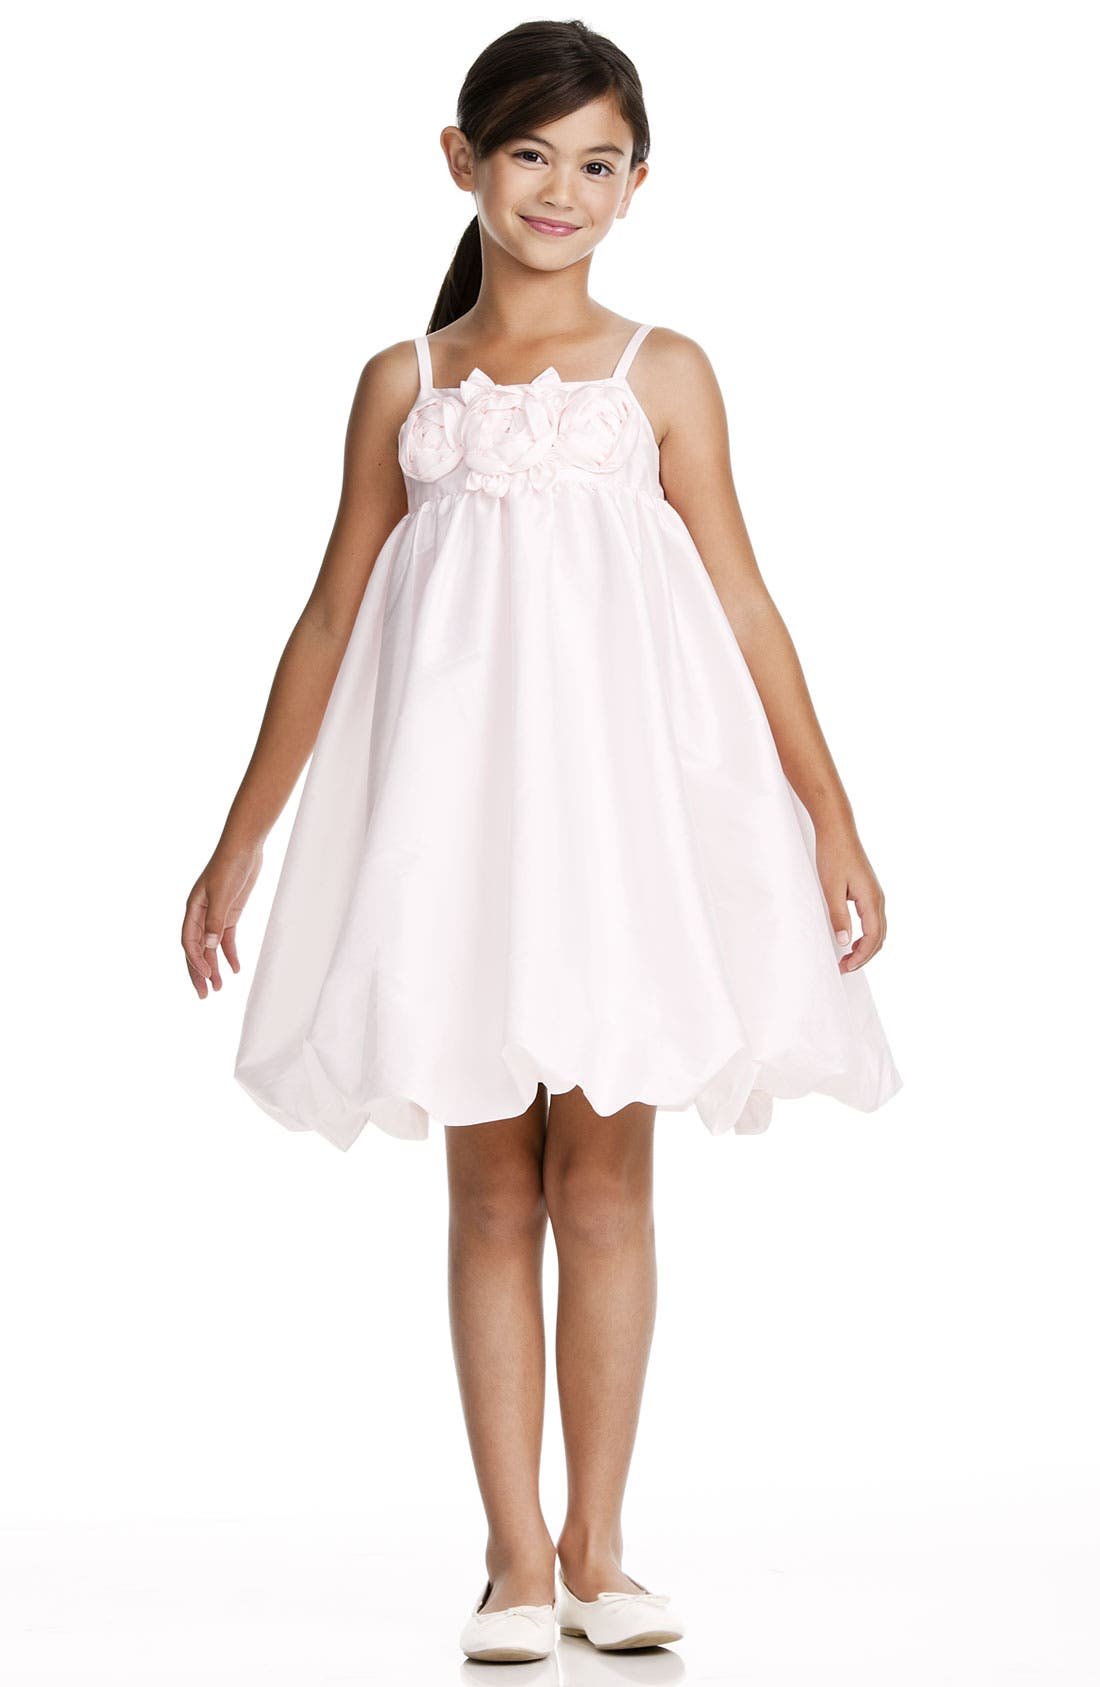 Main Image - Us Angels Taffeta Rosette Bubble Dress (Toddler)